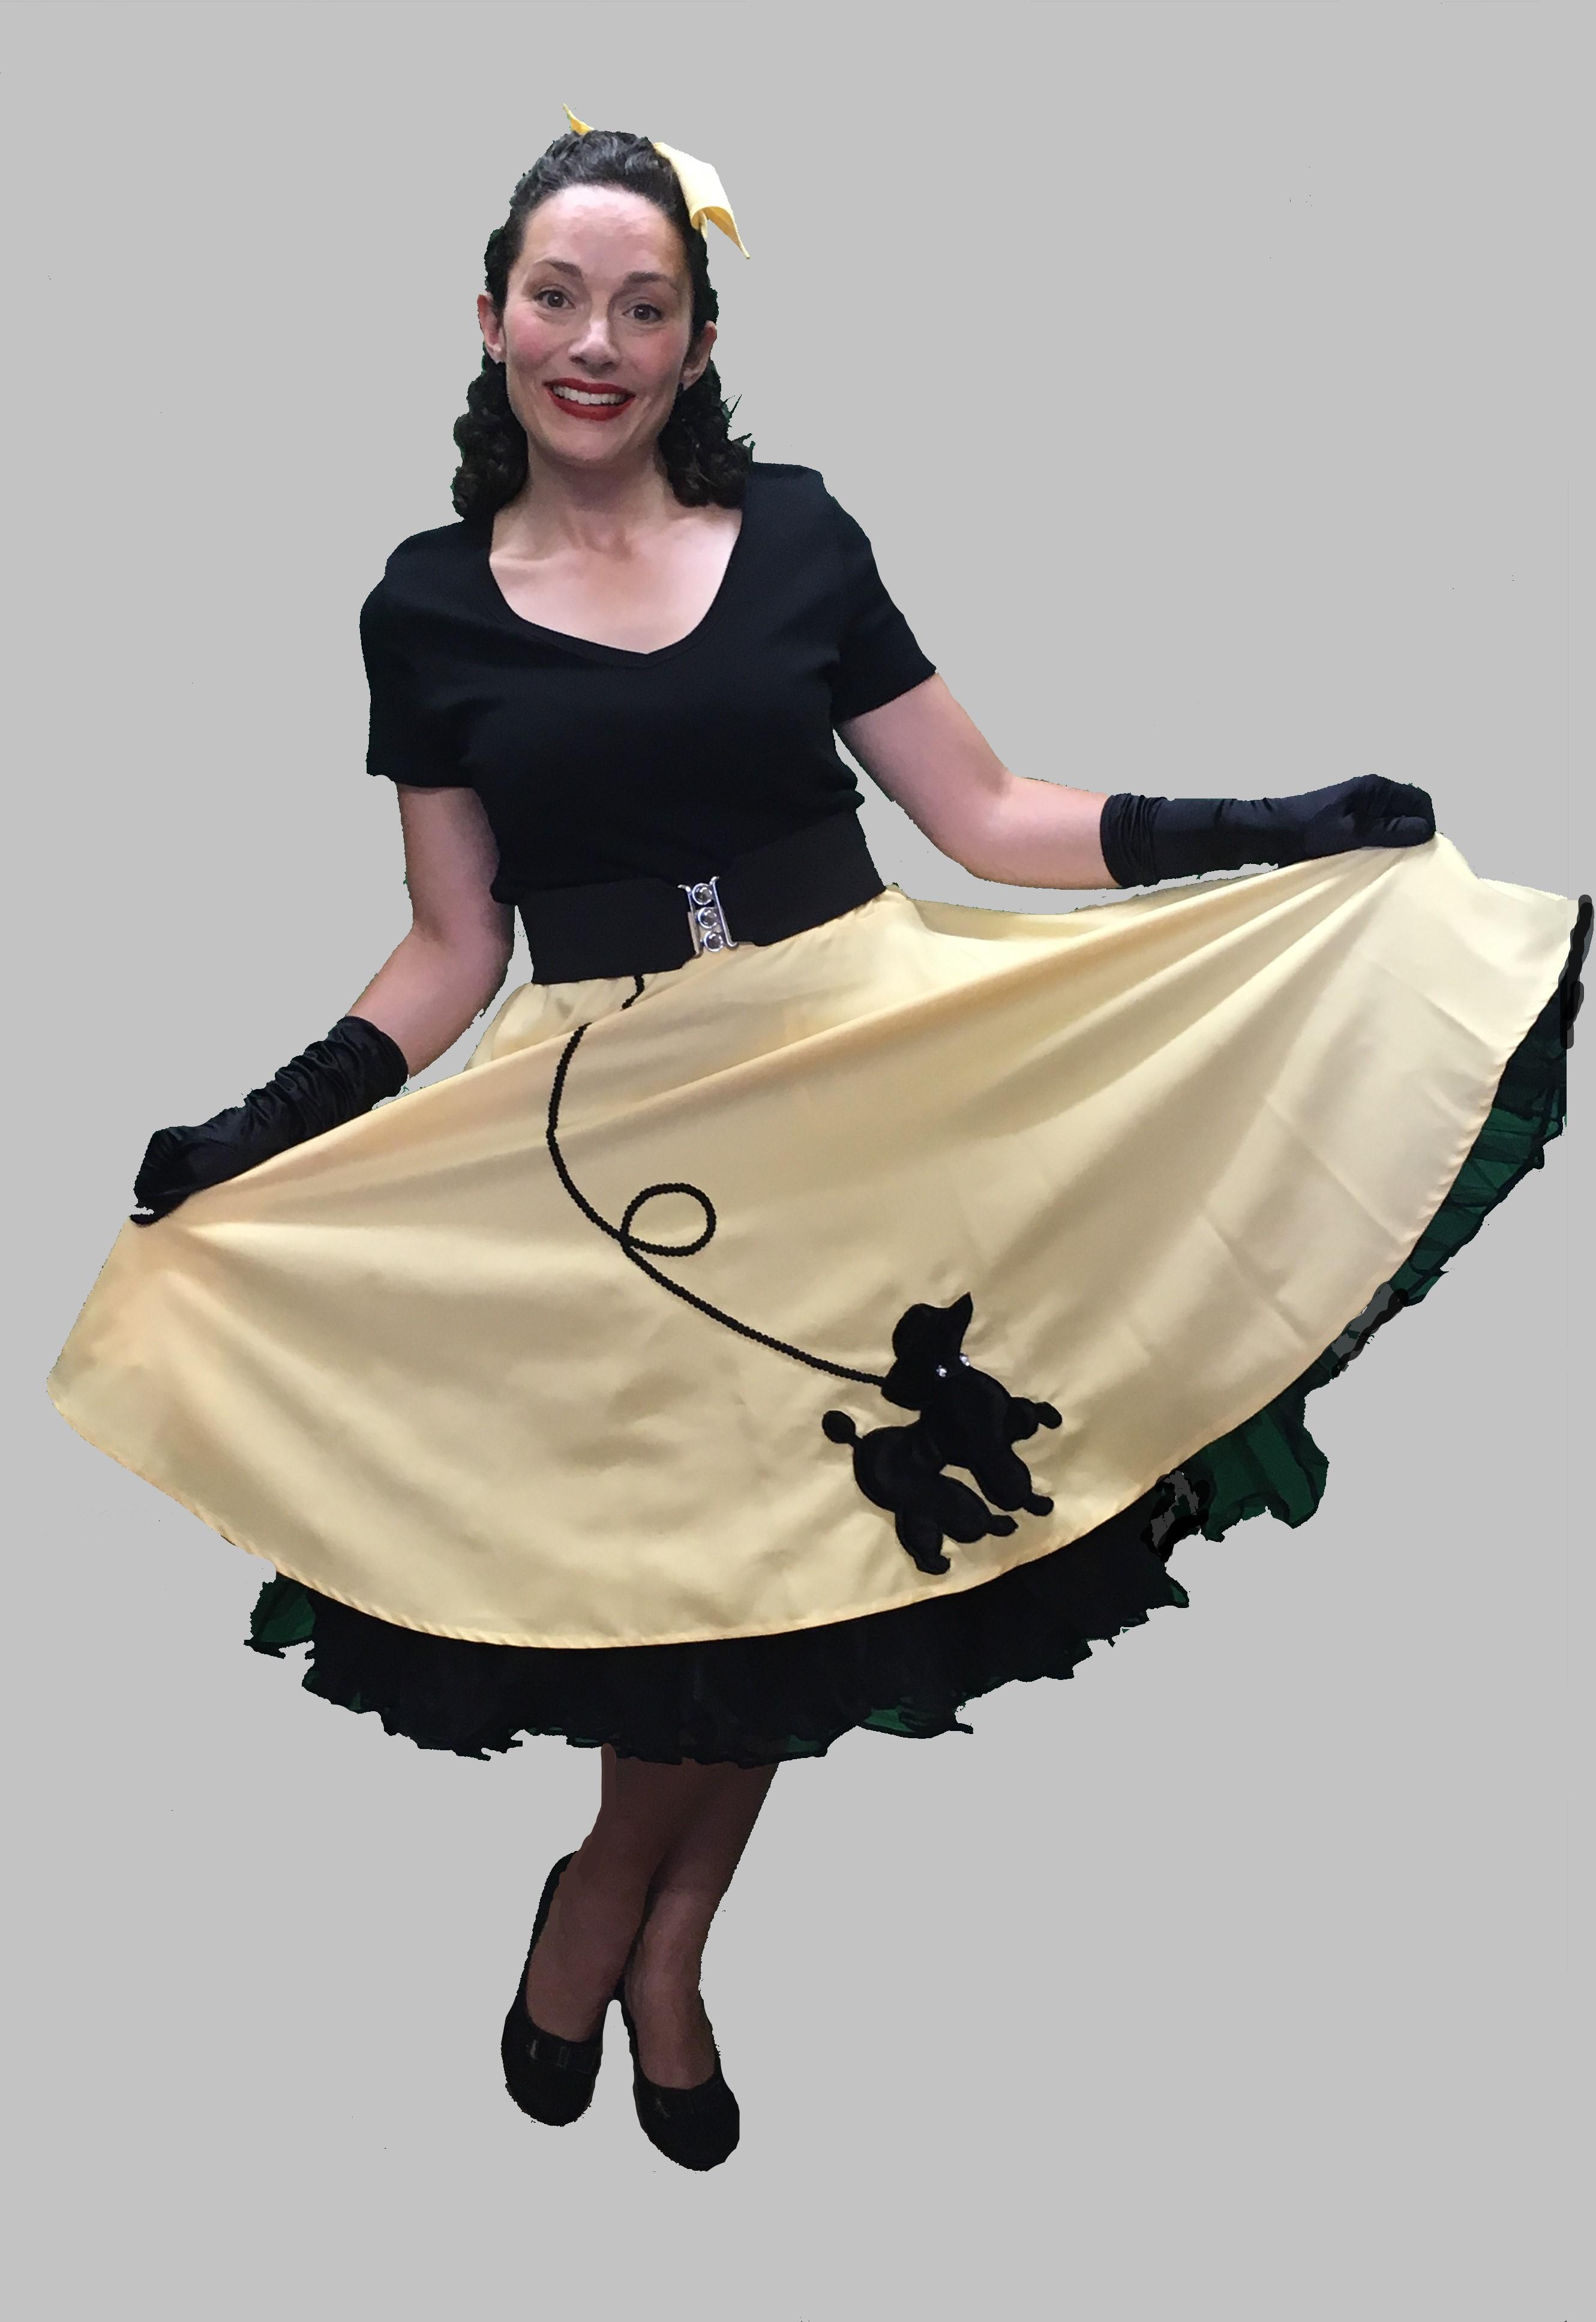 50s Rock N Roll Skirt And Top 1950s Fancy Dress